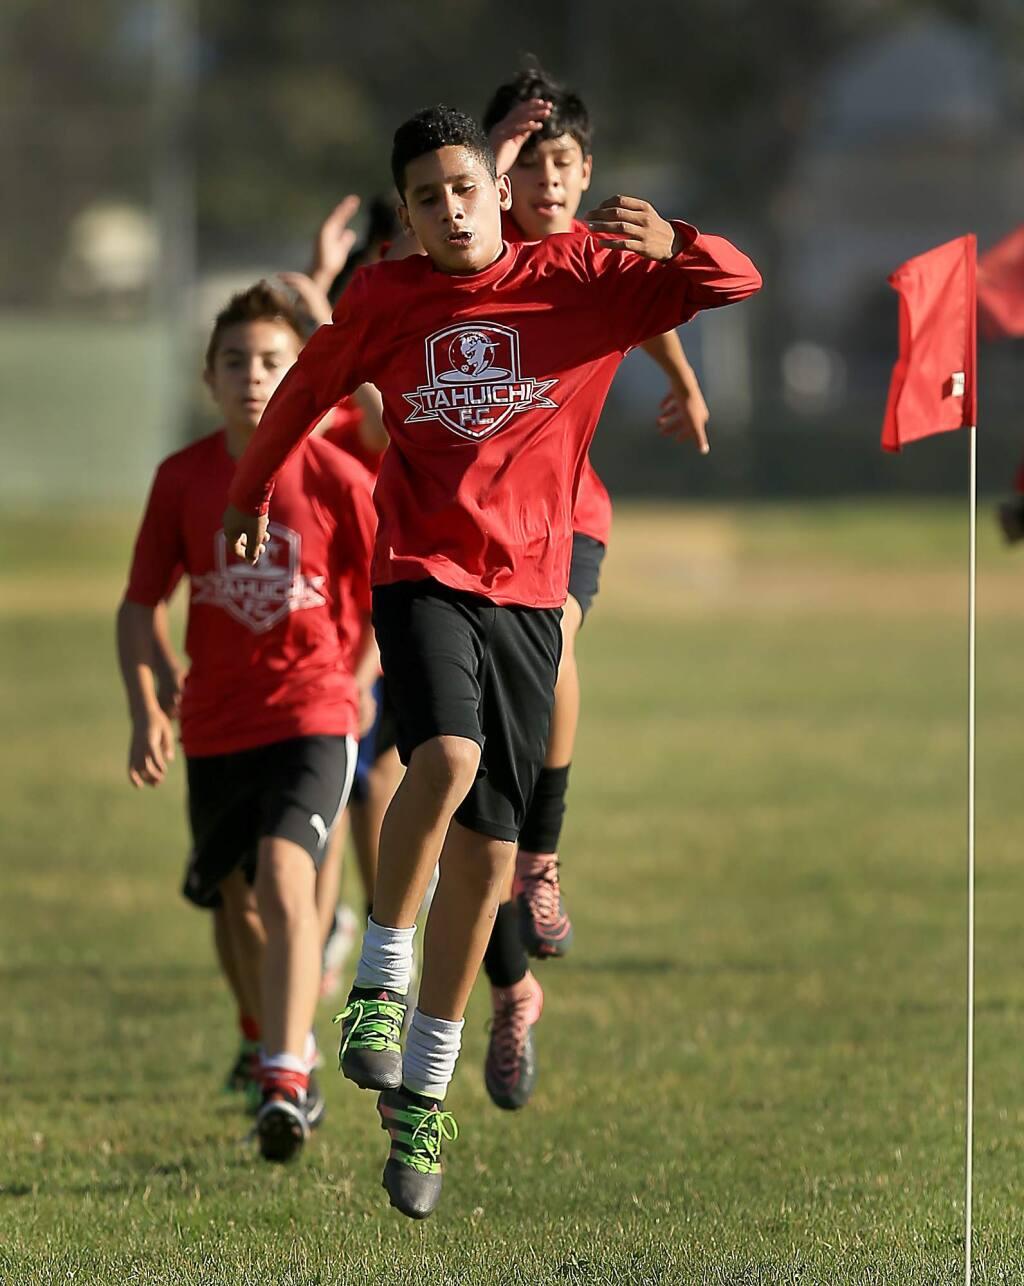 Older kids of the Tahuichi soccer league limber up during a team practice at Elsie Allen High School, Tuesday Aug. 9, 2016. (Kent Porter / The Press Democrat) 2016